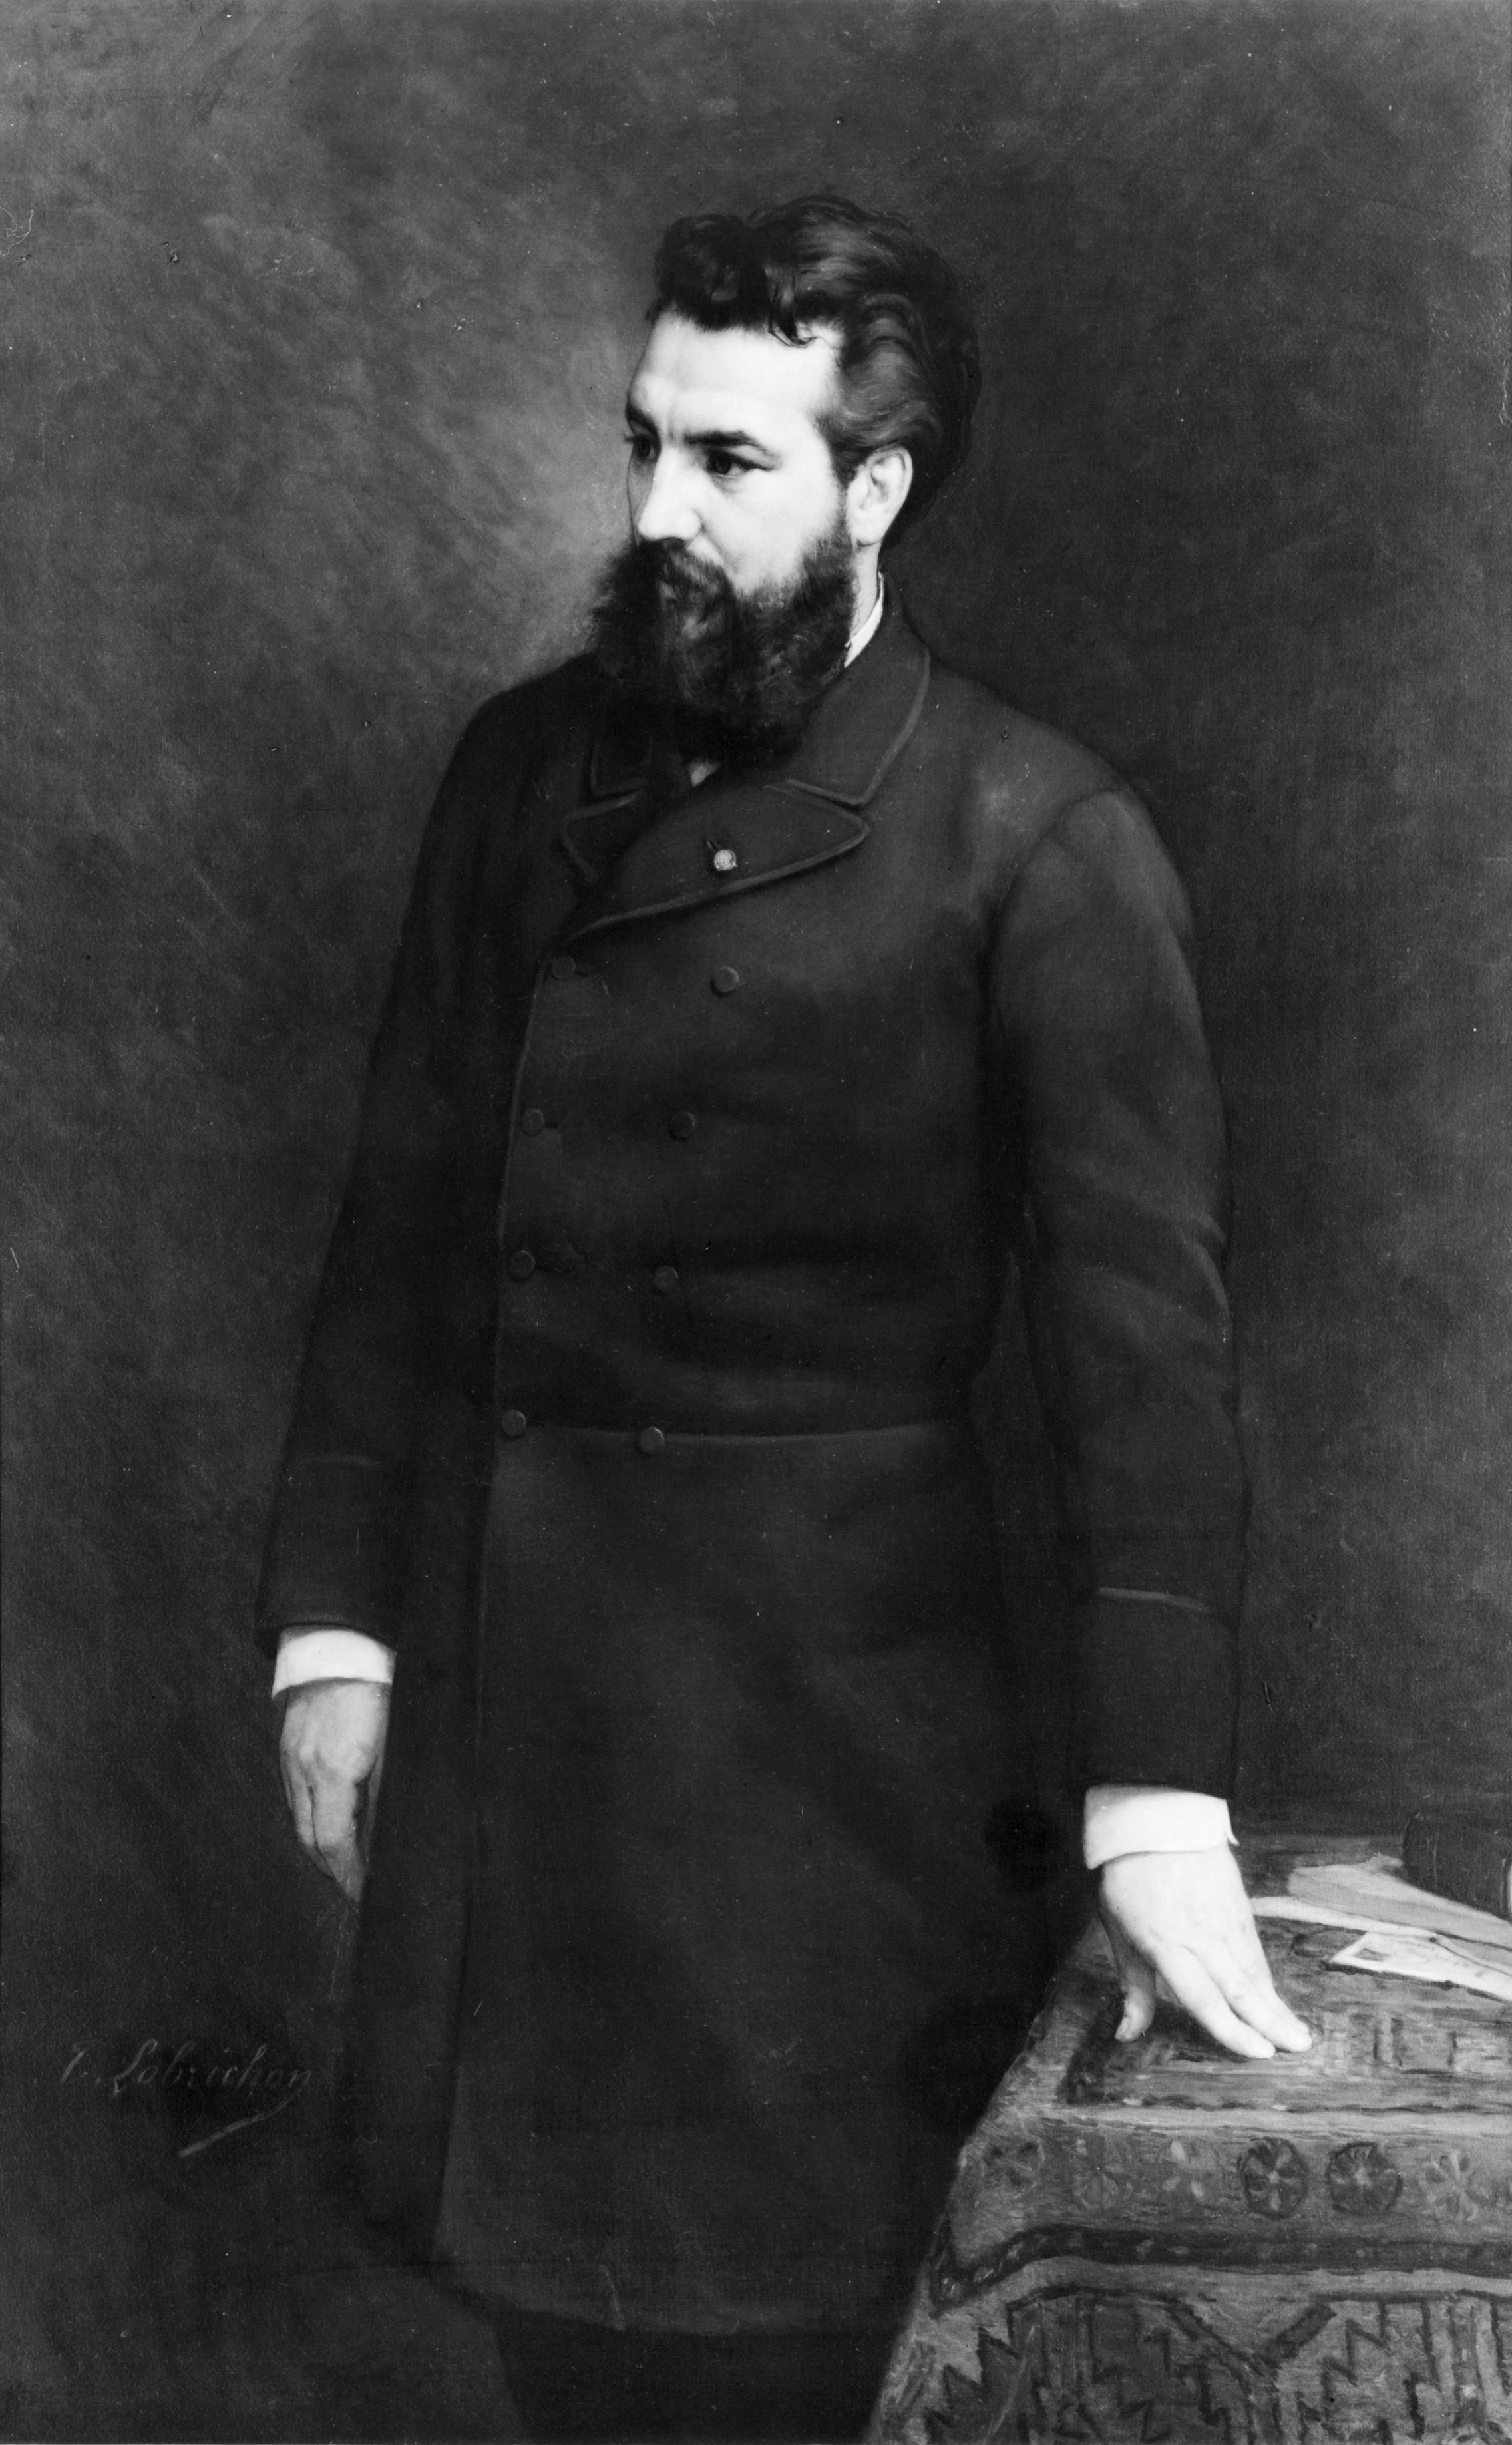 ألكسندر جراهام بيل .... مخترع التليفون Alexander_Graham_Bell,_three-quarter_length_portrait,_standing,_facing_left_-_3c04275r.jpg